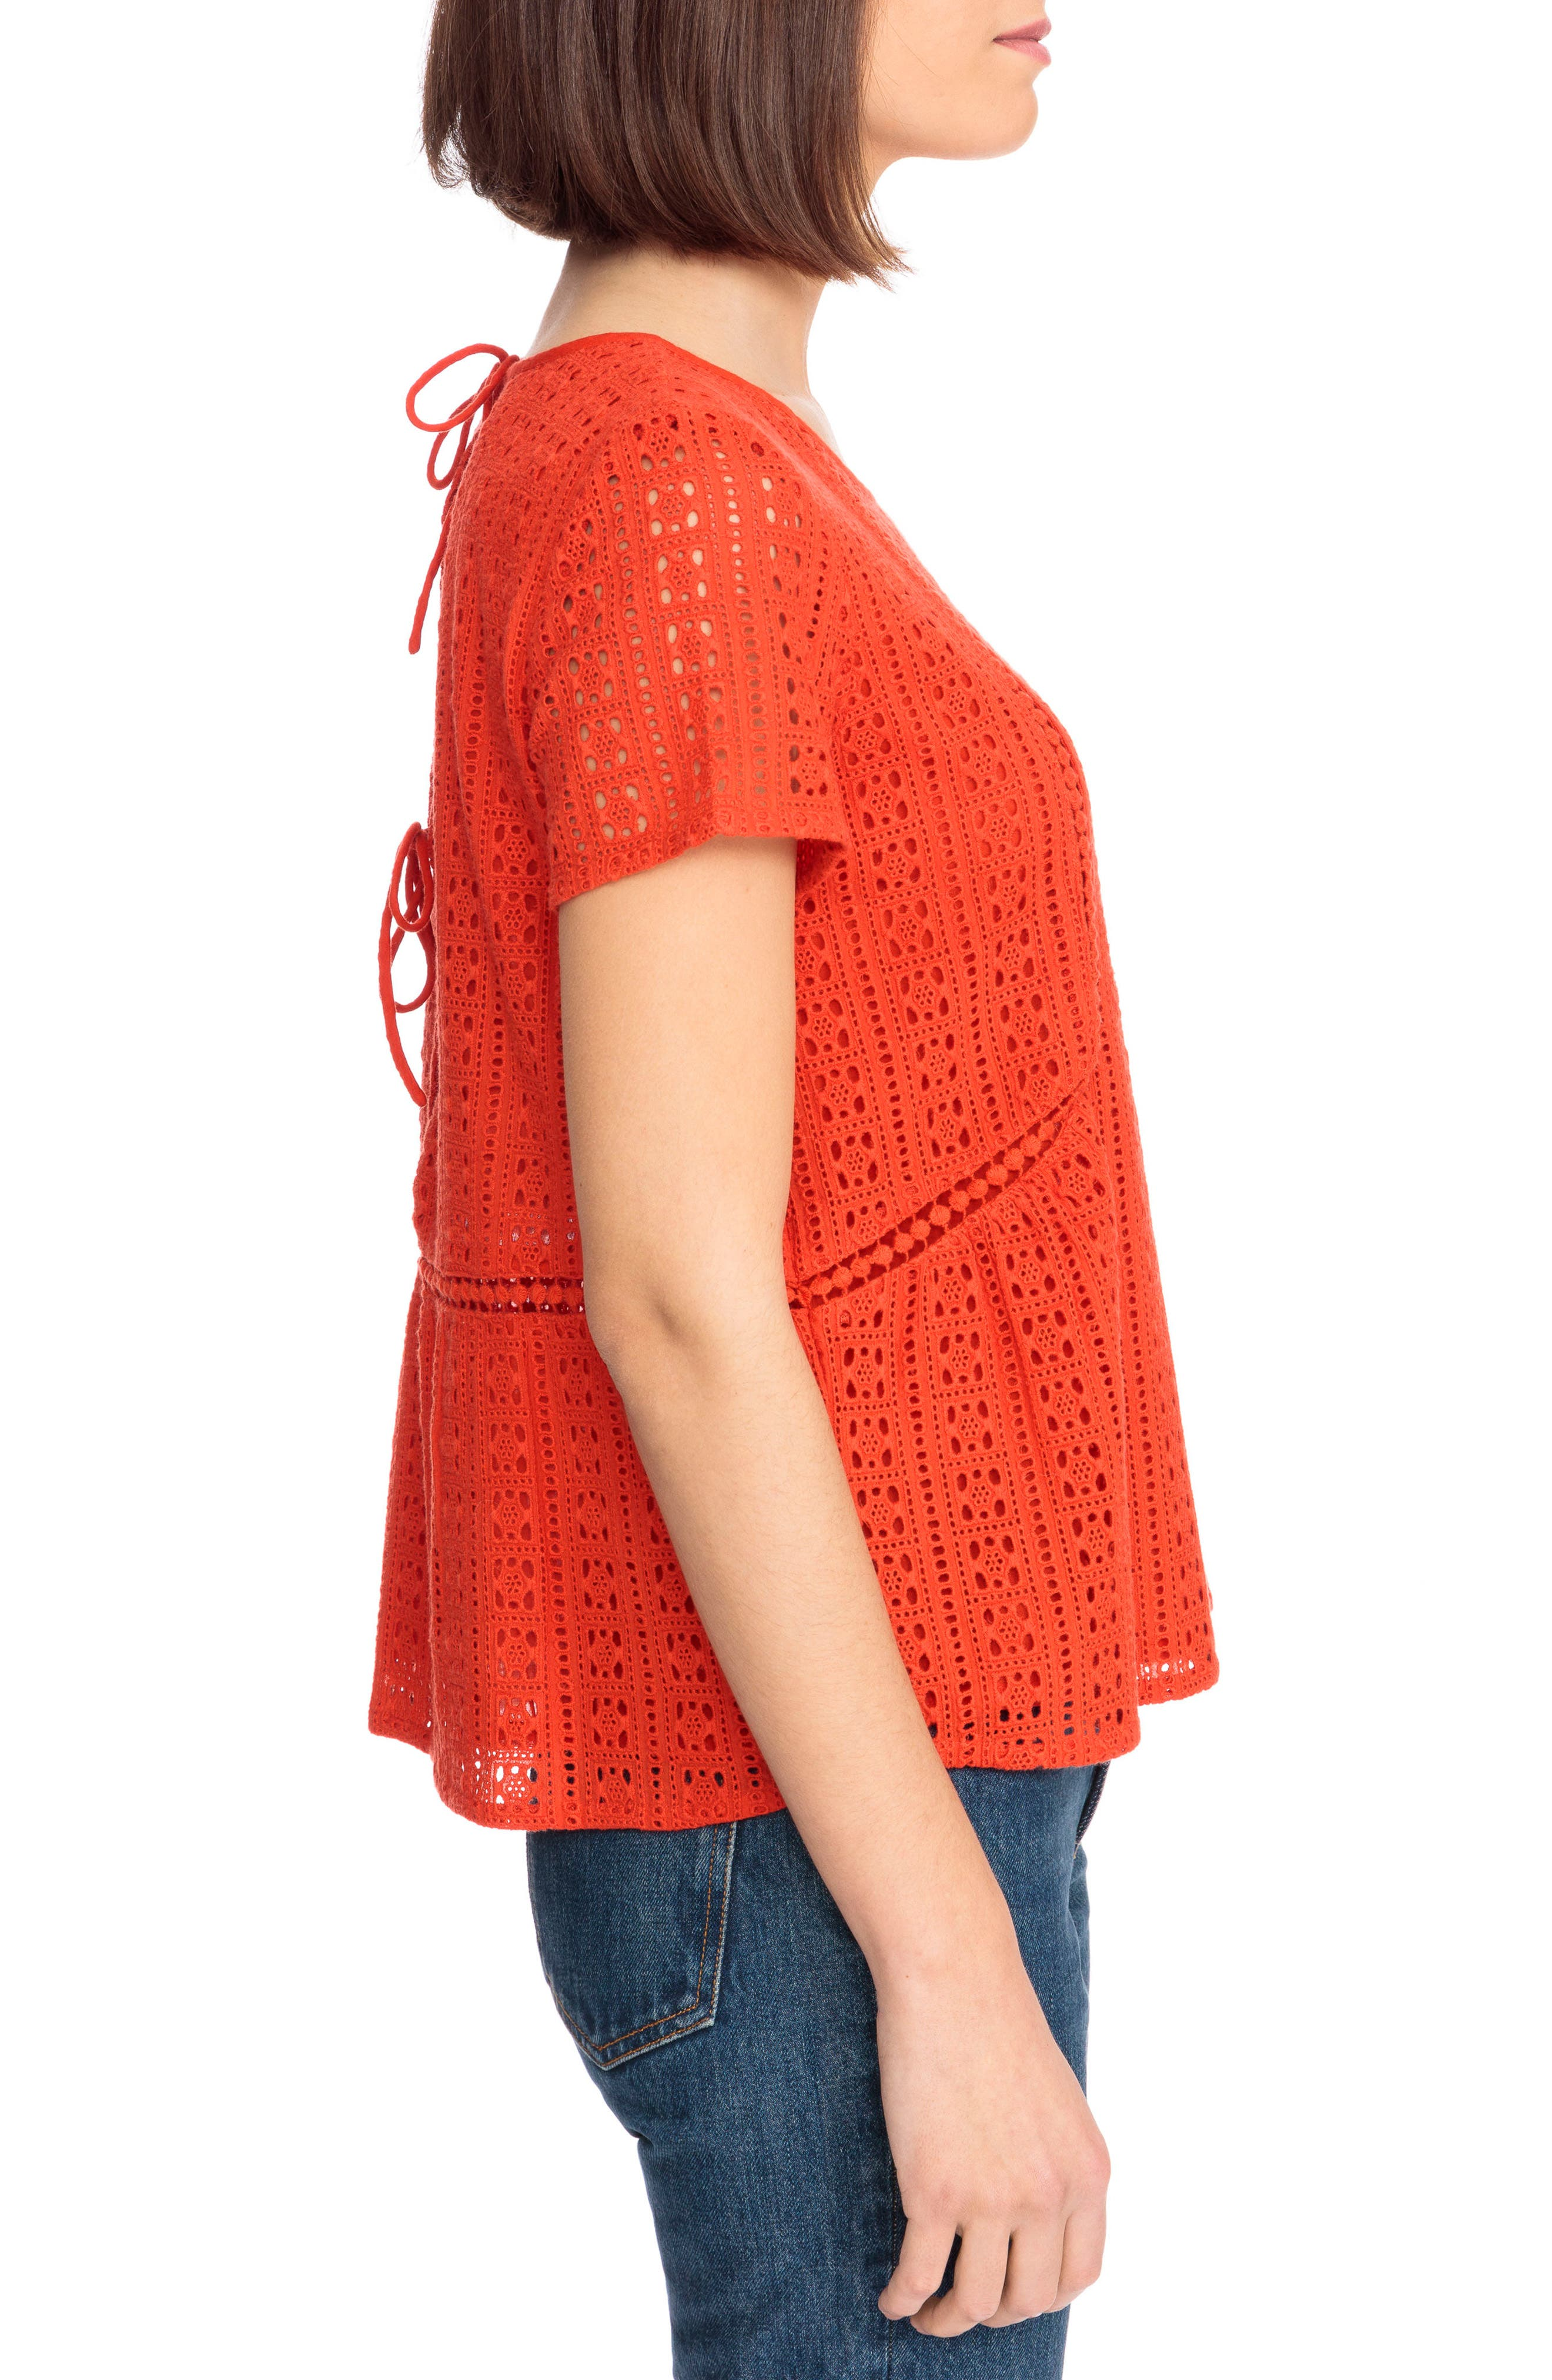 Clo Crochet Blouse,                             Alternate thumbnail 7, color,